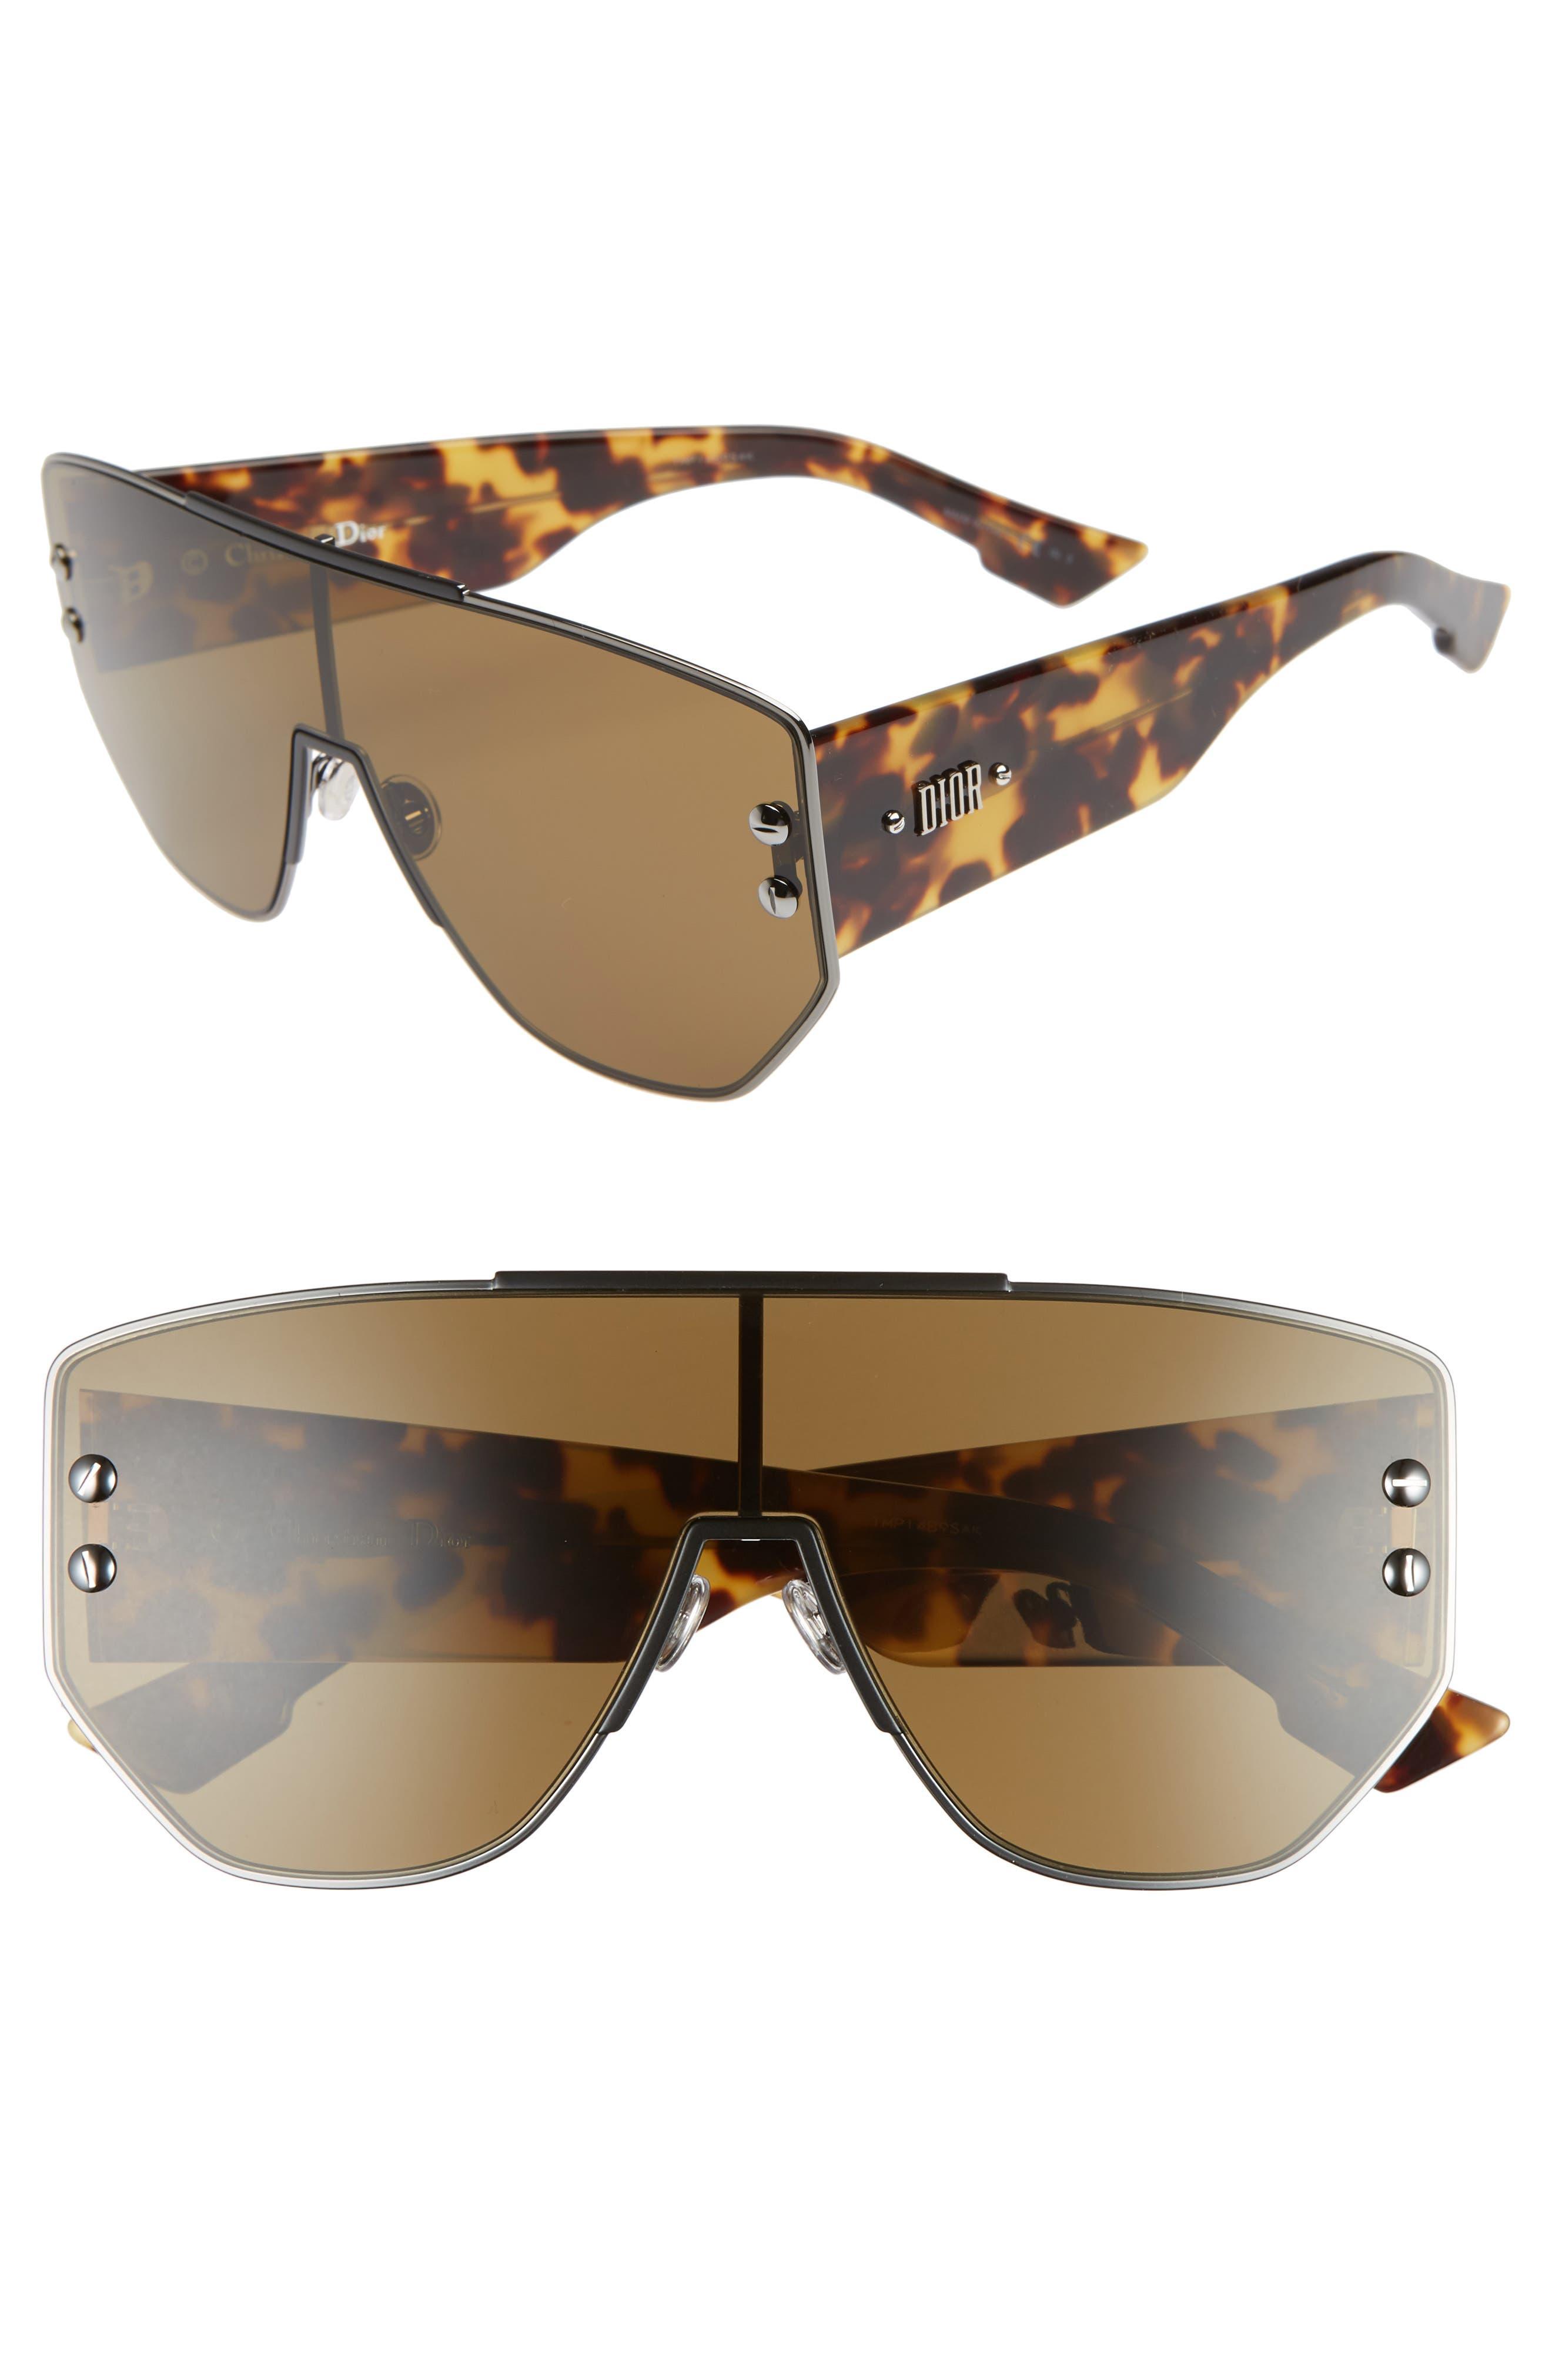 72mm Rimless Shield Sunglasses,                         Main,                         color, DARK RUTHENIUM/ BLACK